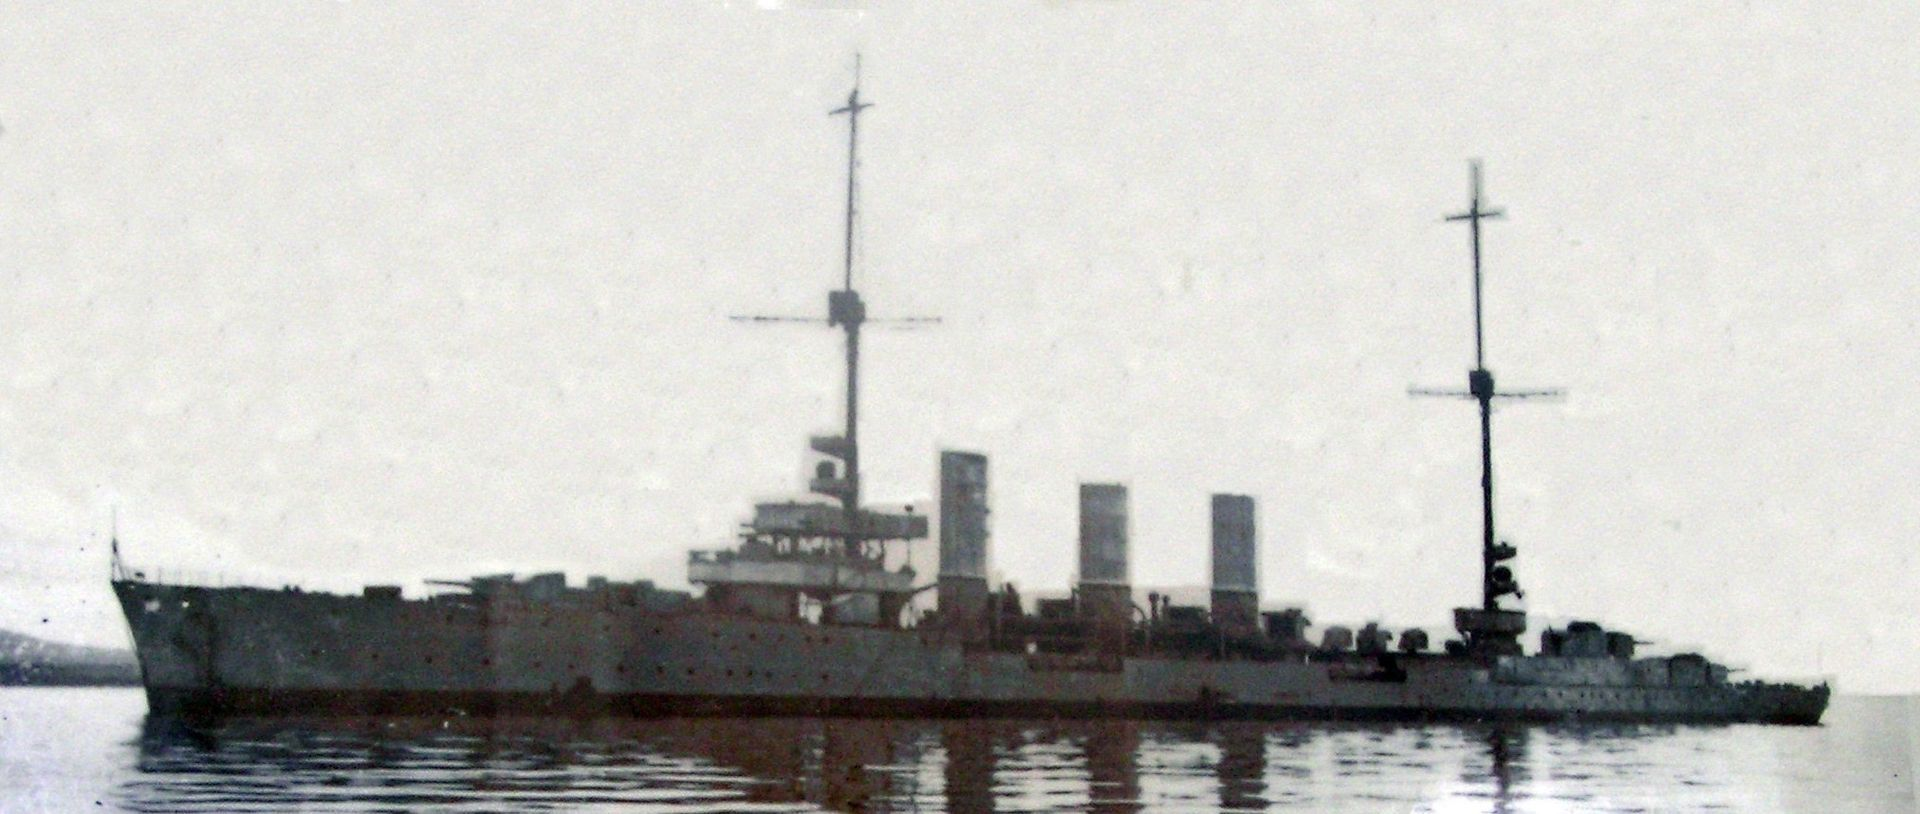 1920px-sms_karlsruhe_uzod2.jpg